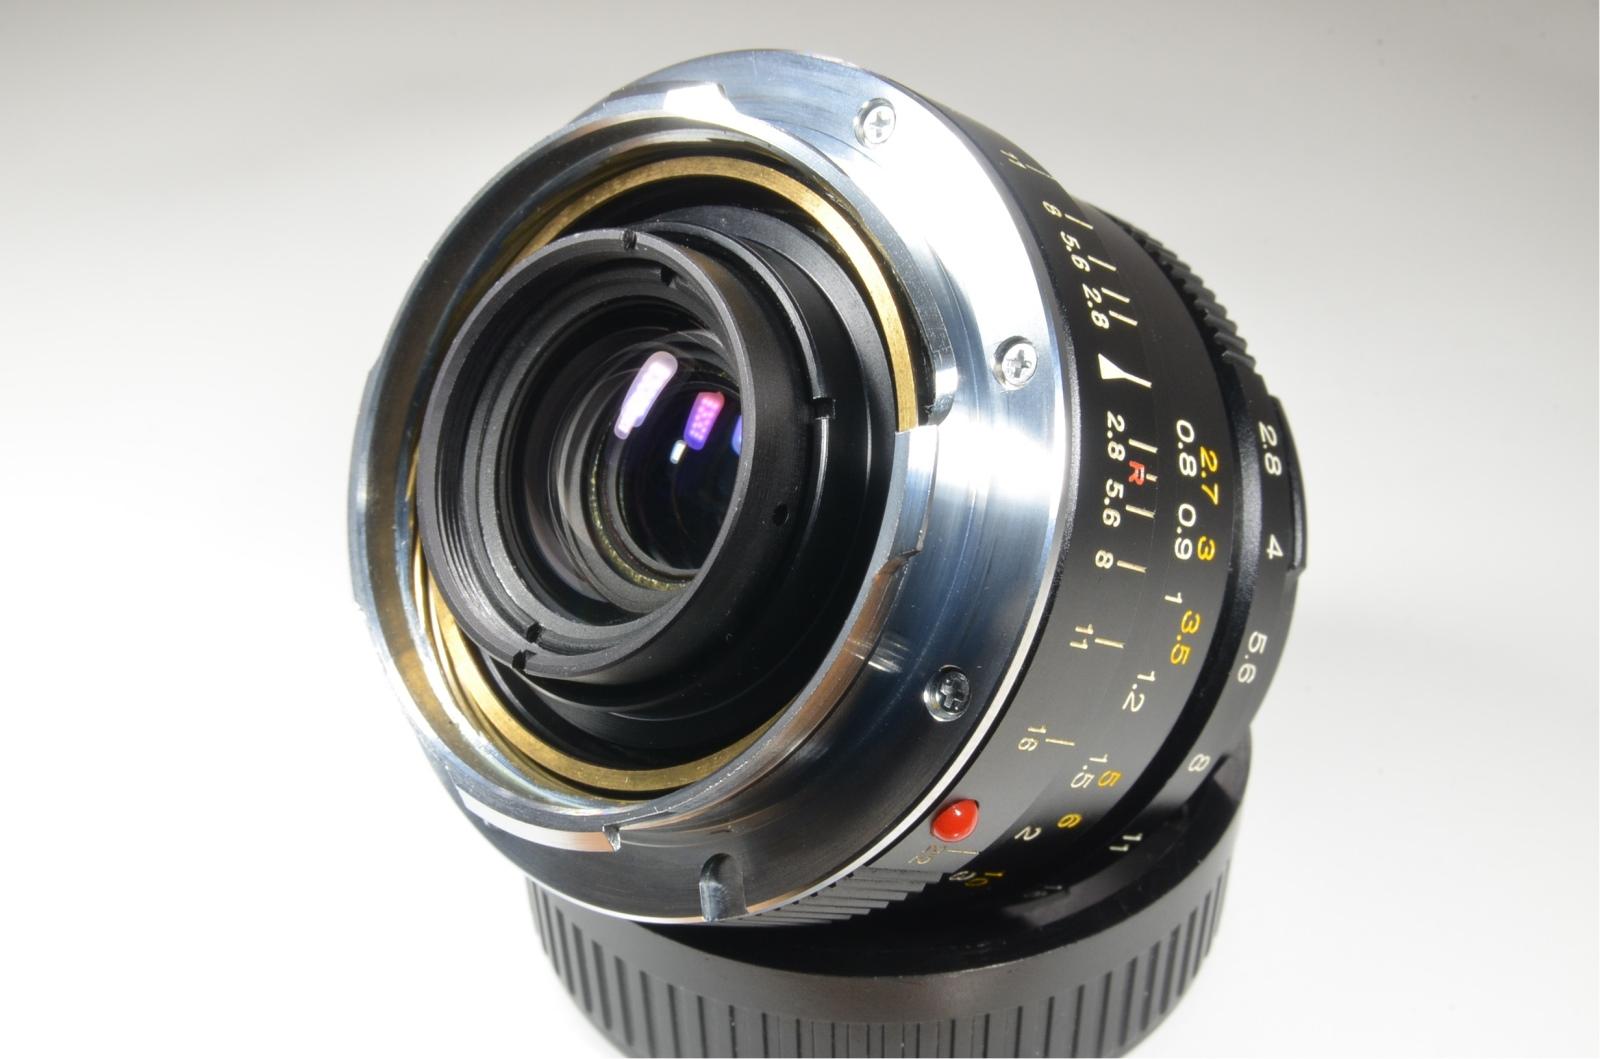 minolta cle film camera, m-rokkor 40mm, 28mm, 90mm, flash and grip